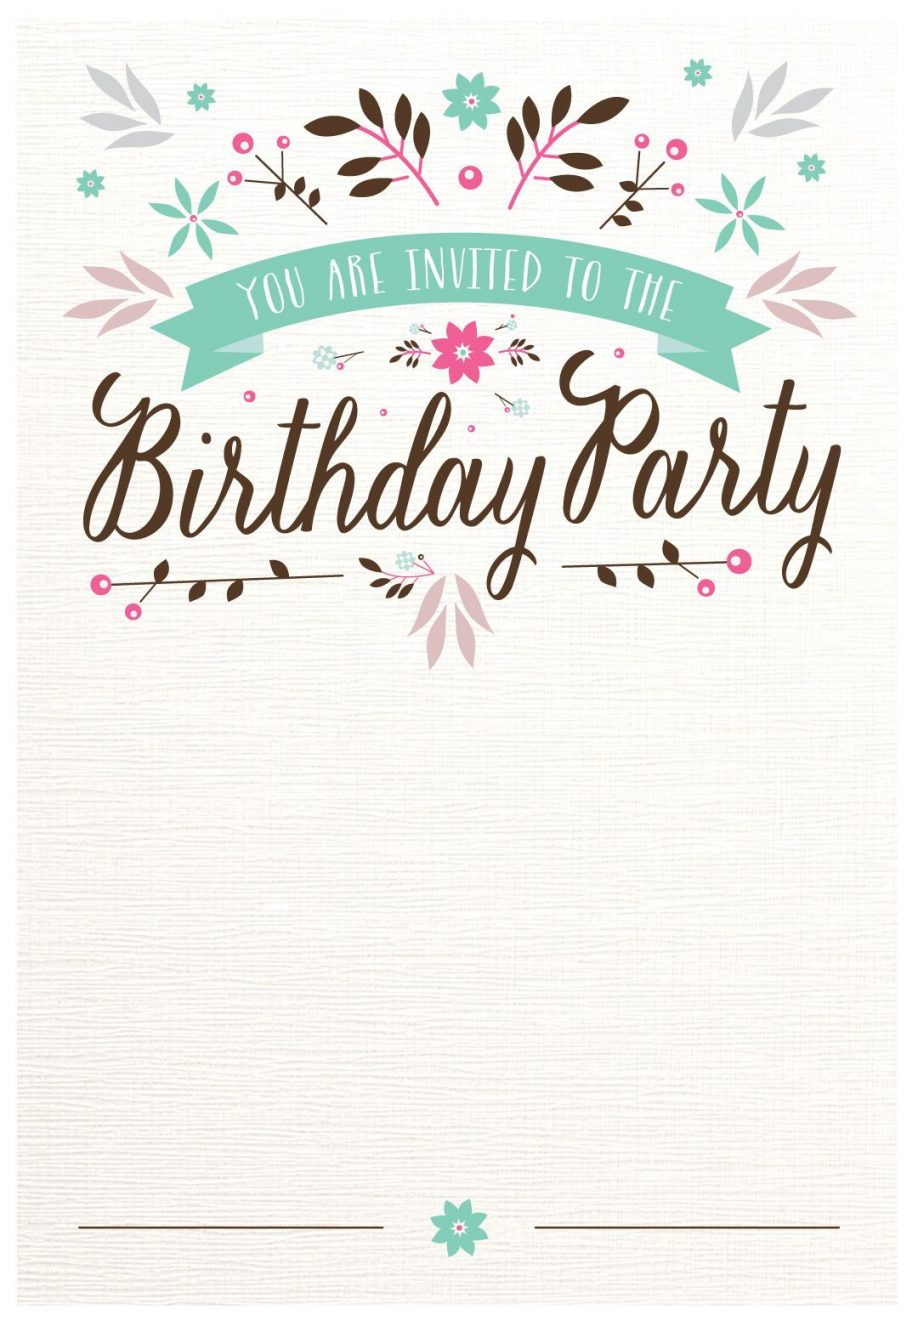 Birthday Inviation Template Invitation Templates Free Online 30Th - Free Printable Invitation Maker